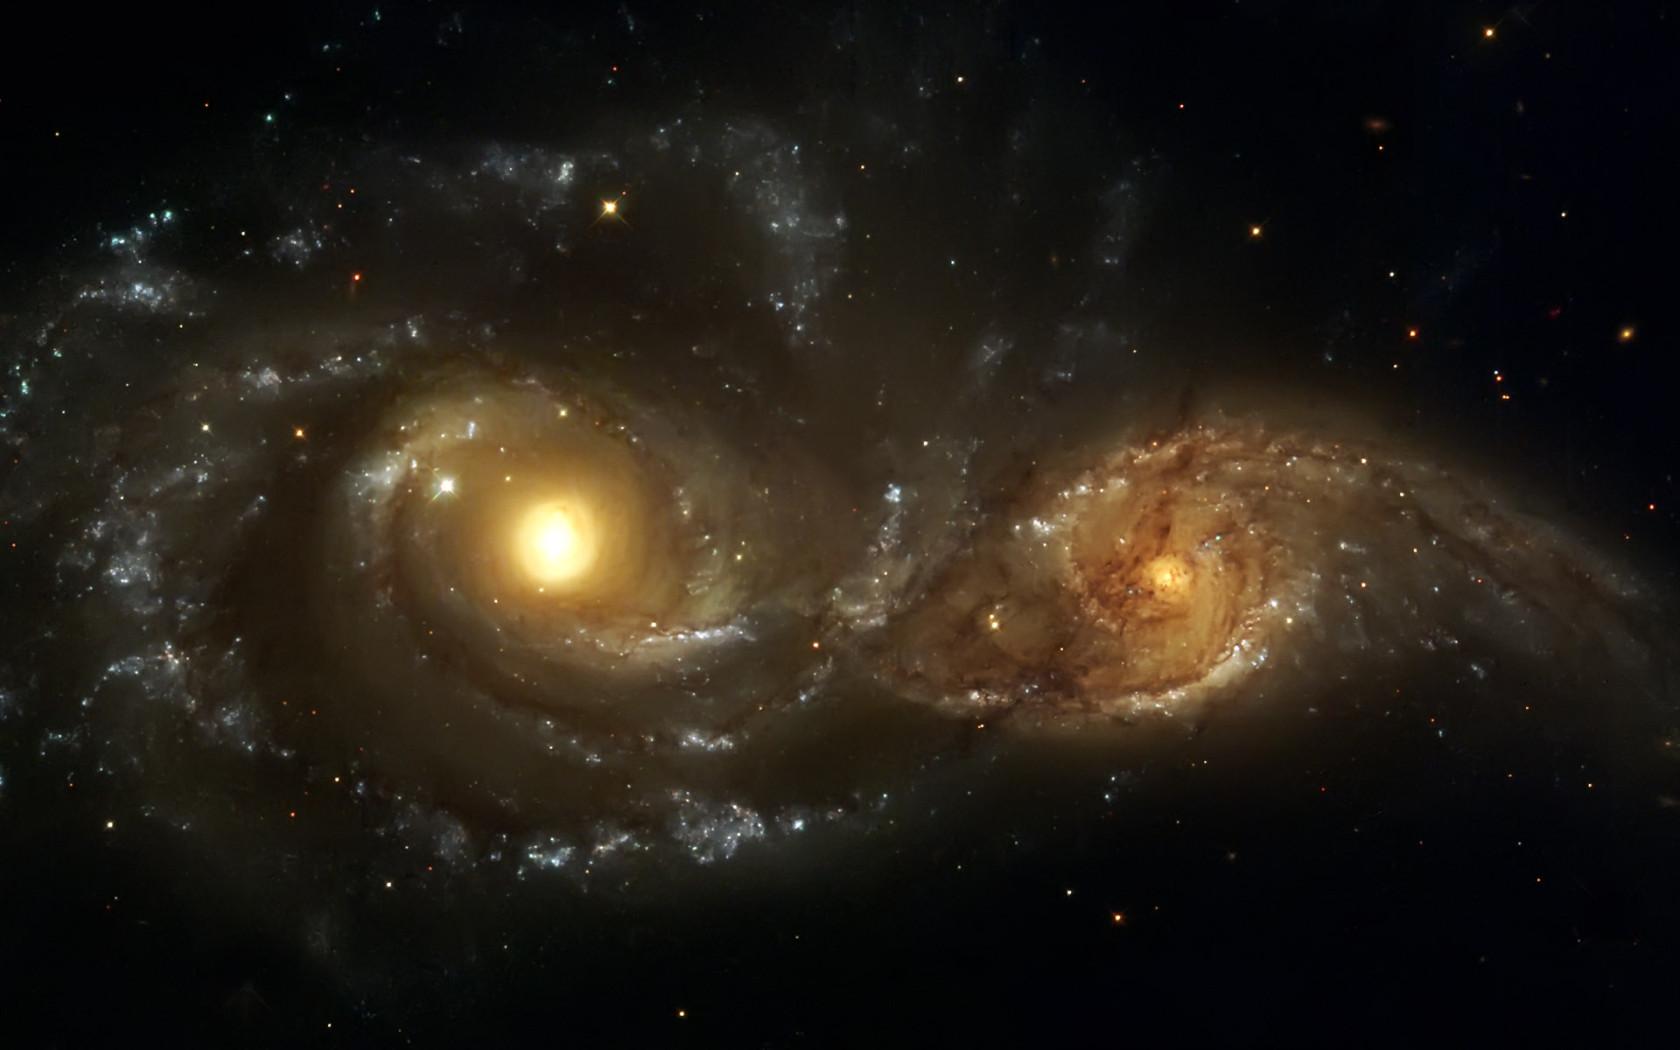 Previous, Space - Deep space wallpaper